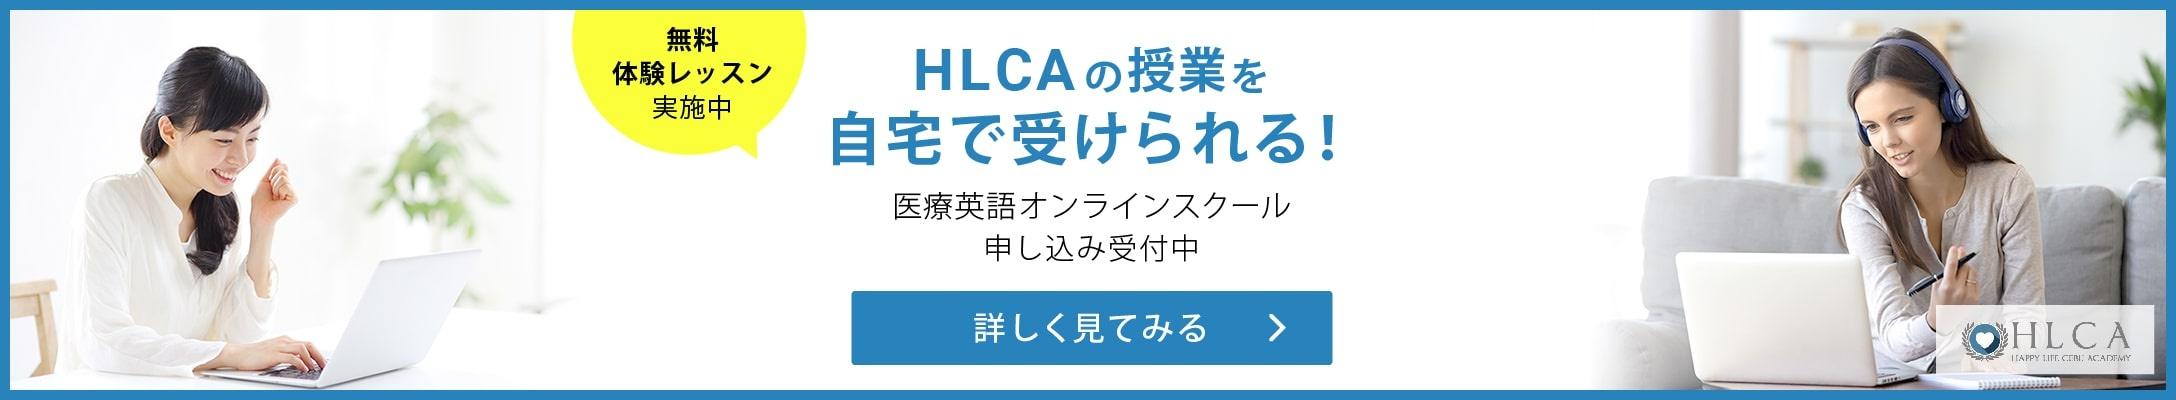 HLCA医療英語オンラインスクール